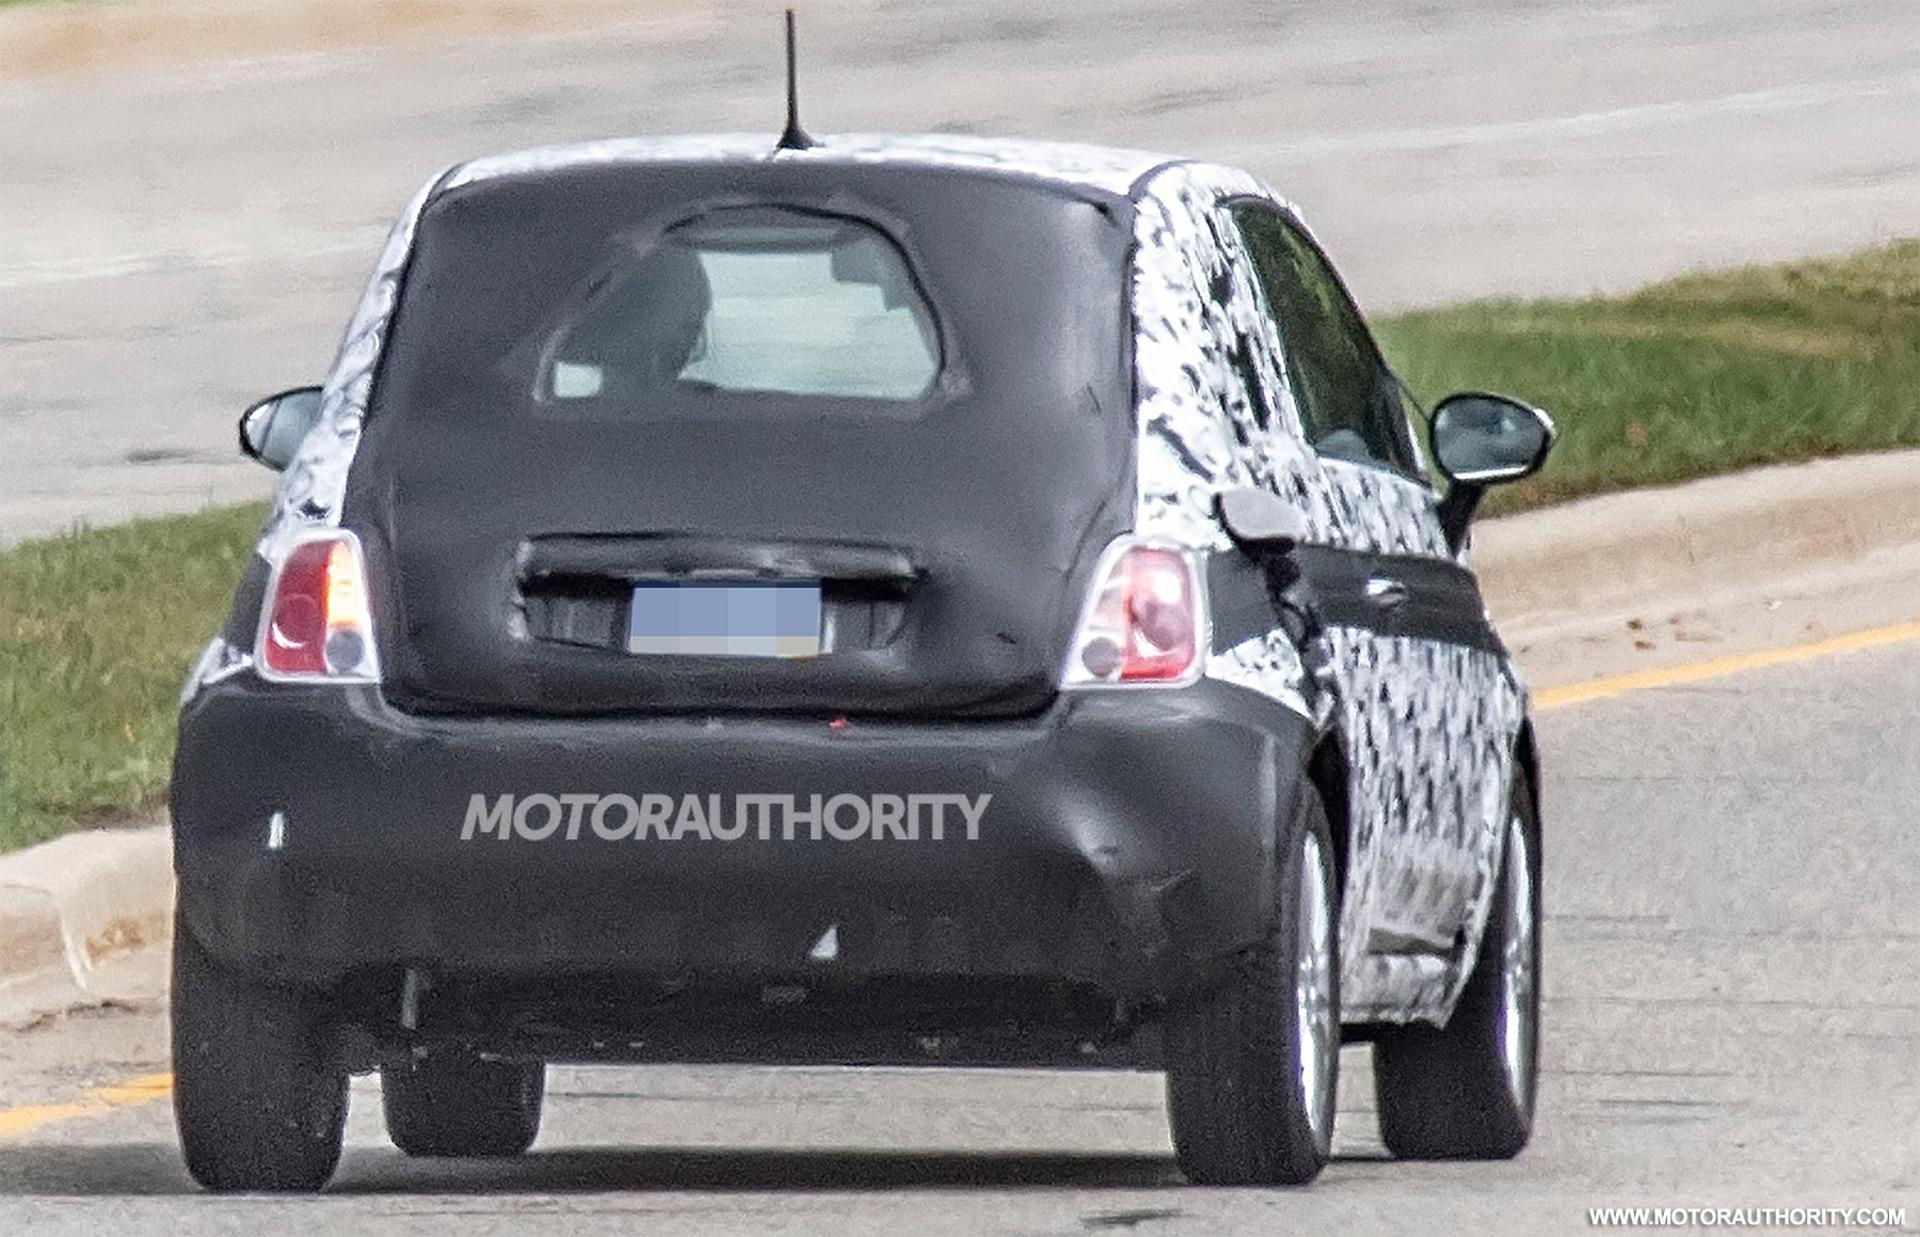 2020 - [Fiat] 500 e - Page 7 2020-fiat-500e-spy-shots--image-via-s-baldauf-sb-medien_100708608_h